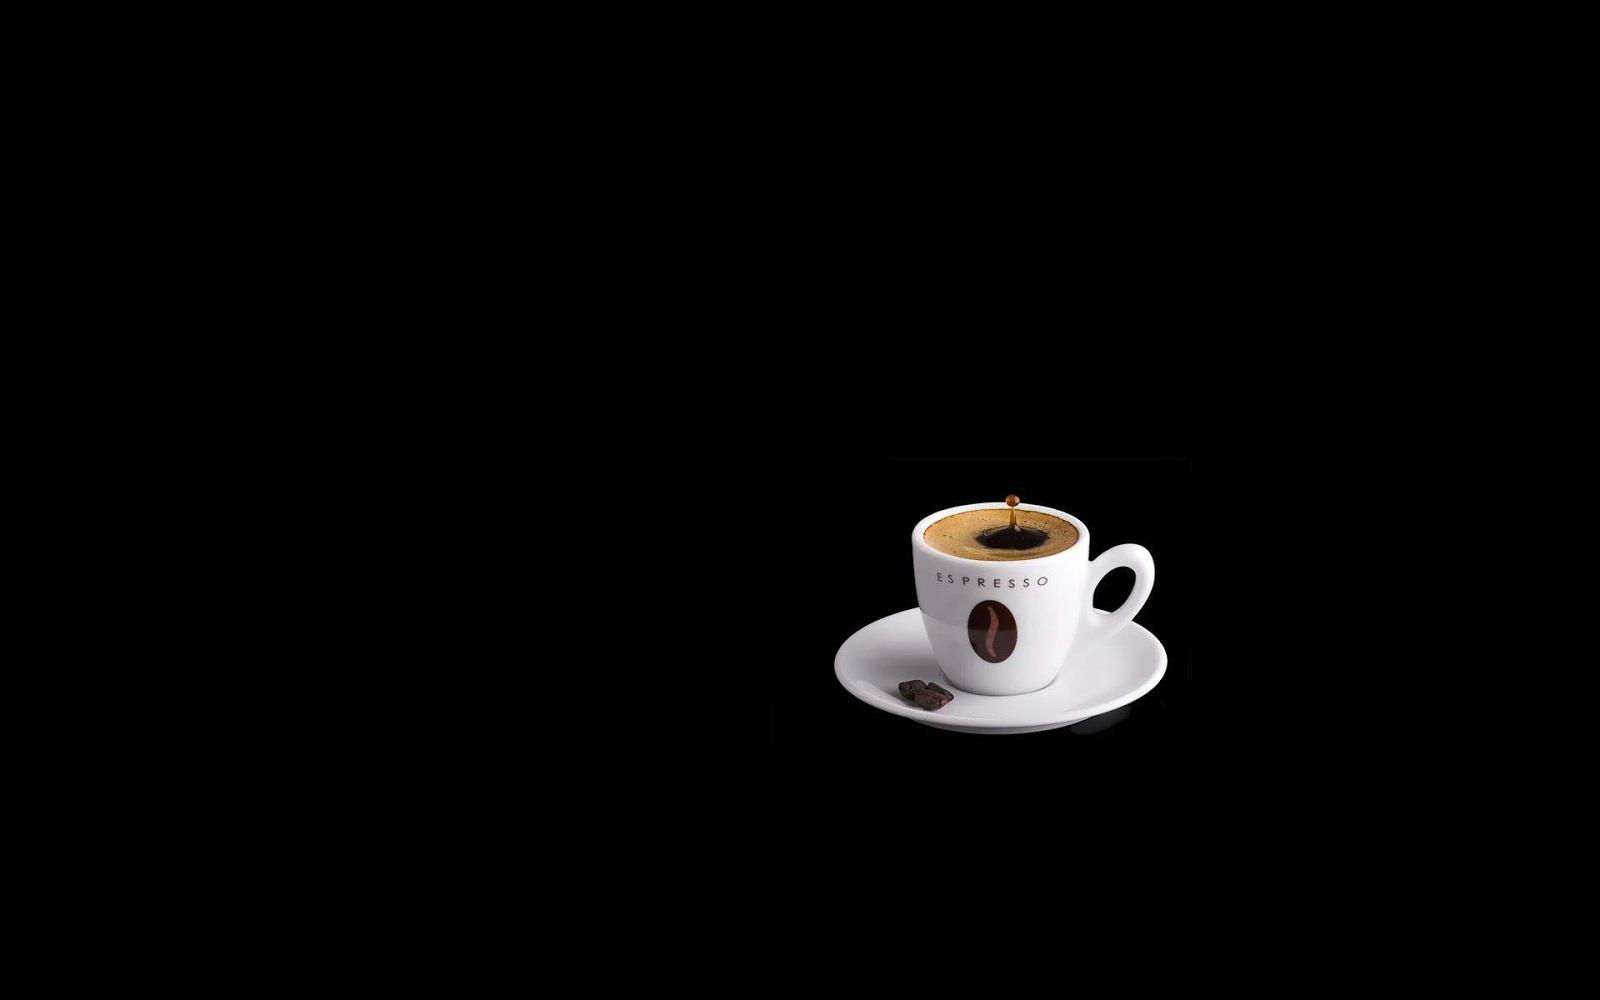 http://4.bp.blogspot.com/-dhRTKObEIQ8/ULLEAsZ63fI/AAAAAAAAAxM/2BmssN8x_zg/s1600/white-coffee-cup-on-black-background-black-and-white-hd-wallpaper-hd.jpg